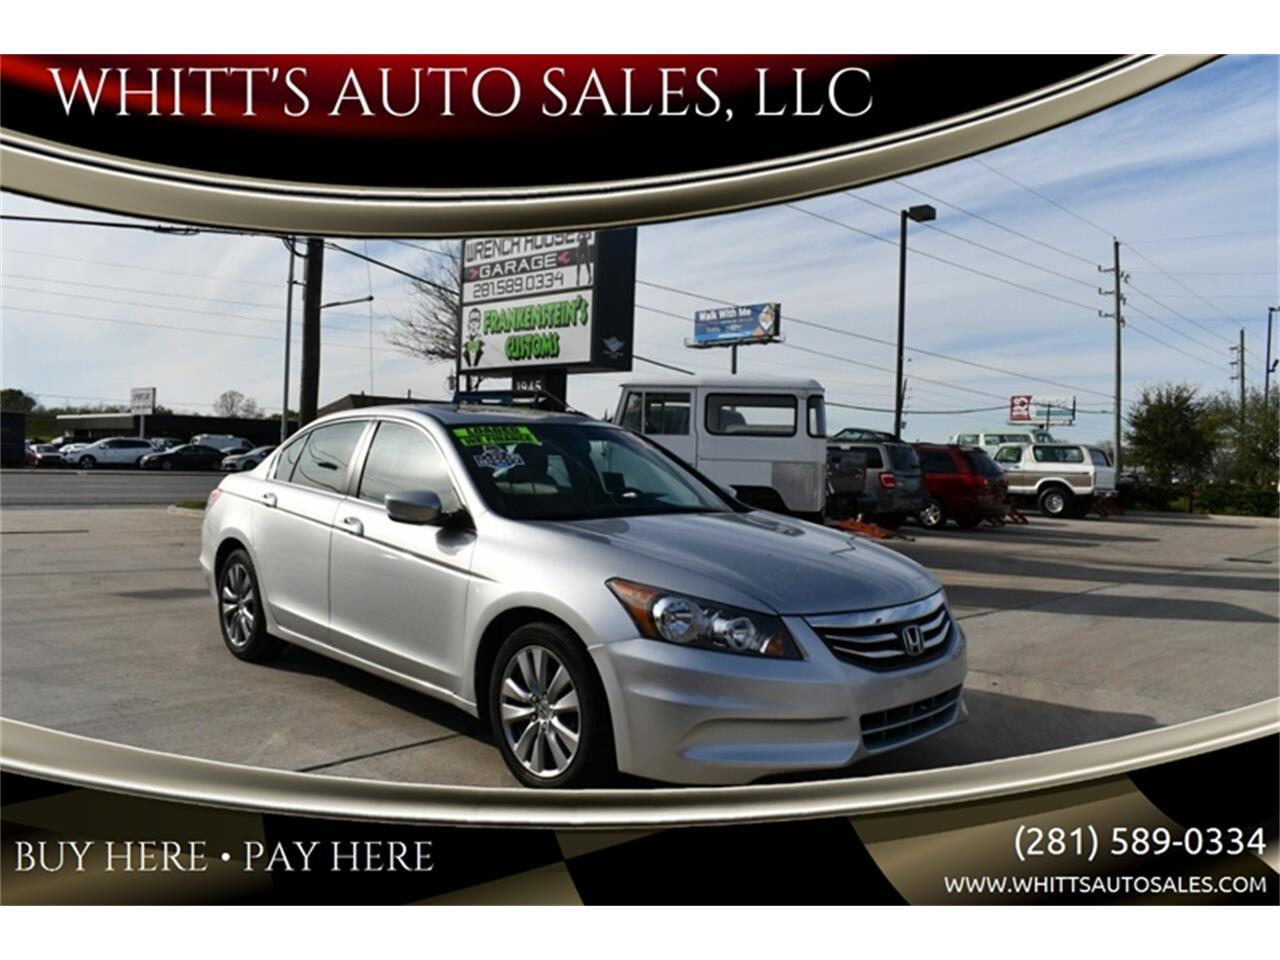 2012 Honda Accord For Sale >> For Sale 2012 Honda Accord In Houston Texas